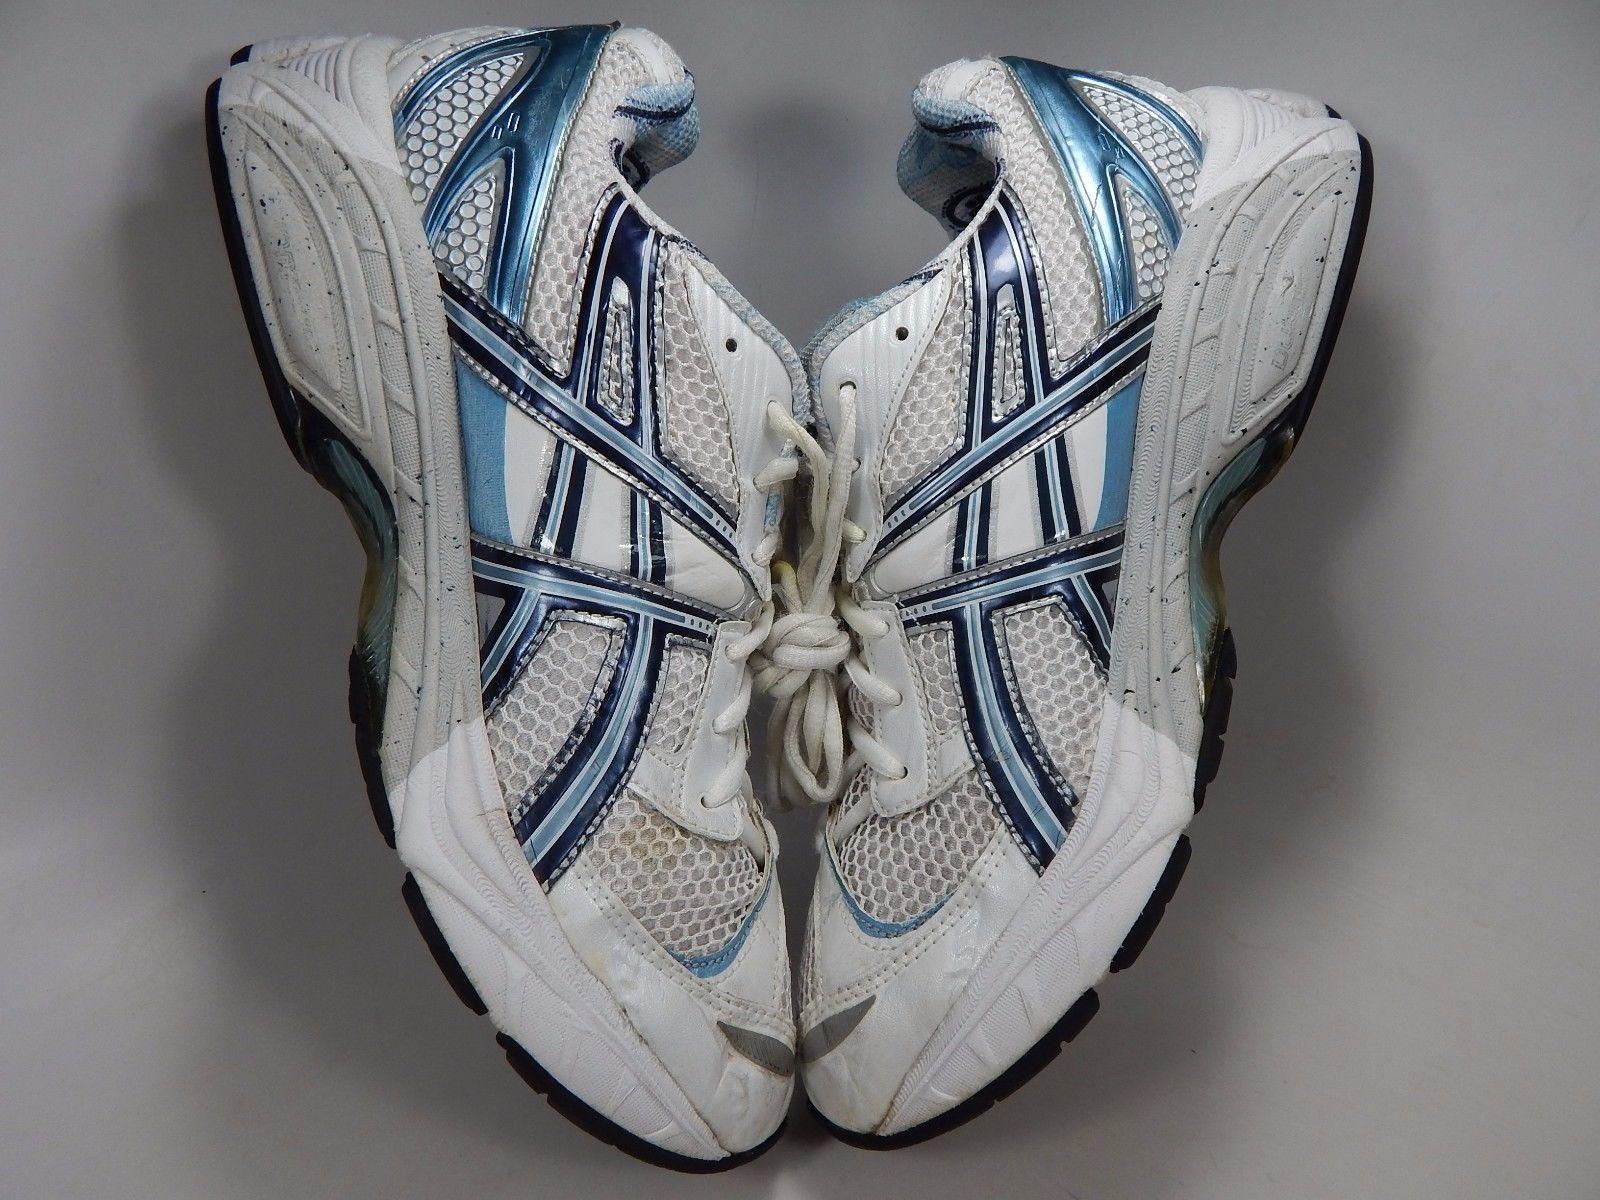 Asics Gel Kayano  15 Women's Running Shoes Sz US 11 M (B) EU 43.5 White T950N